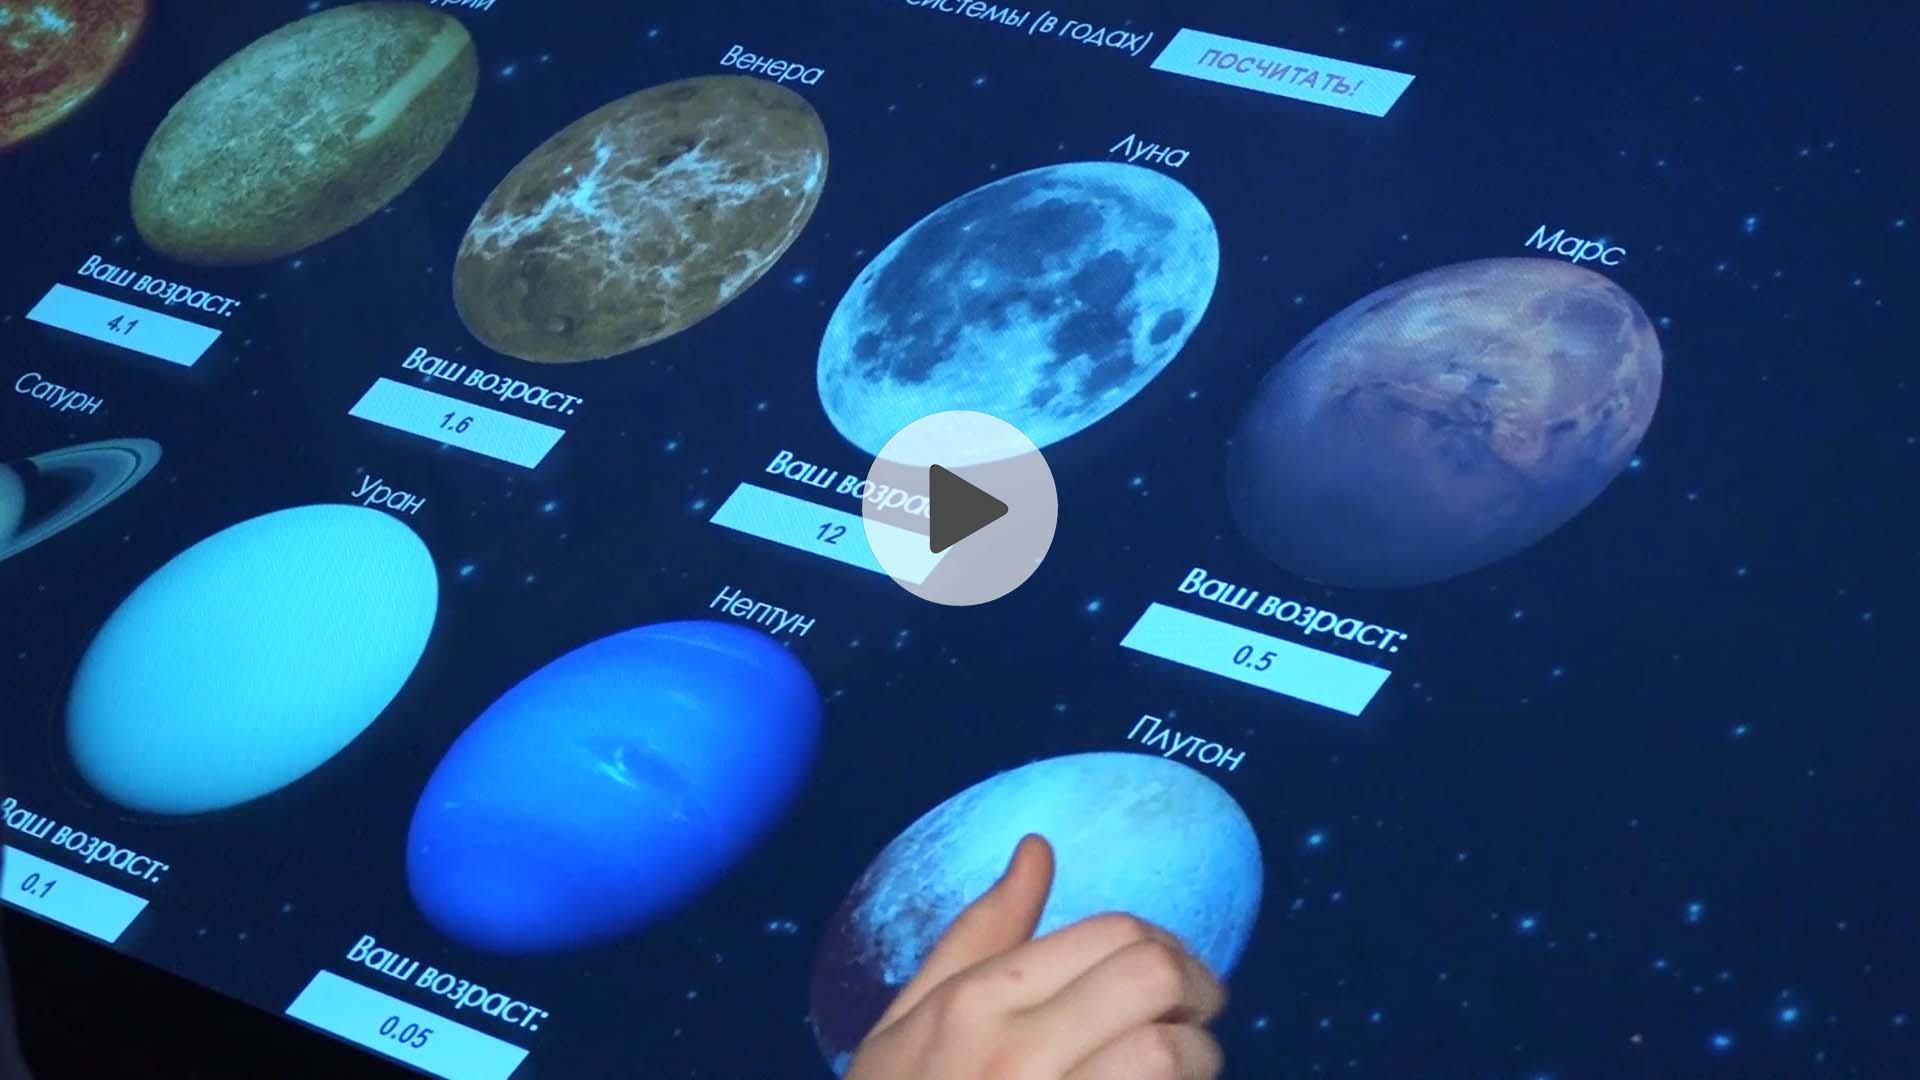 Видео-презентация космо-выставки